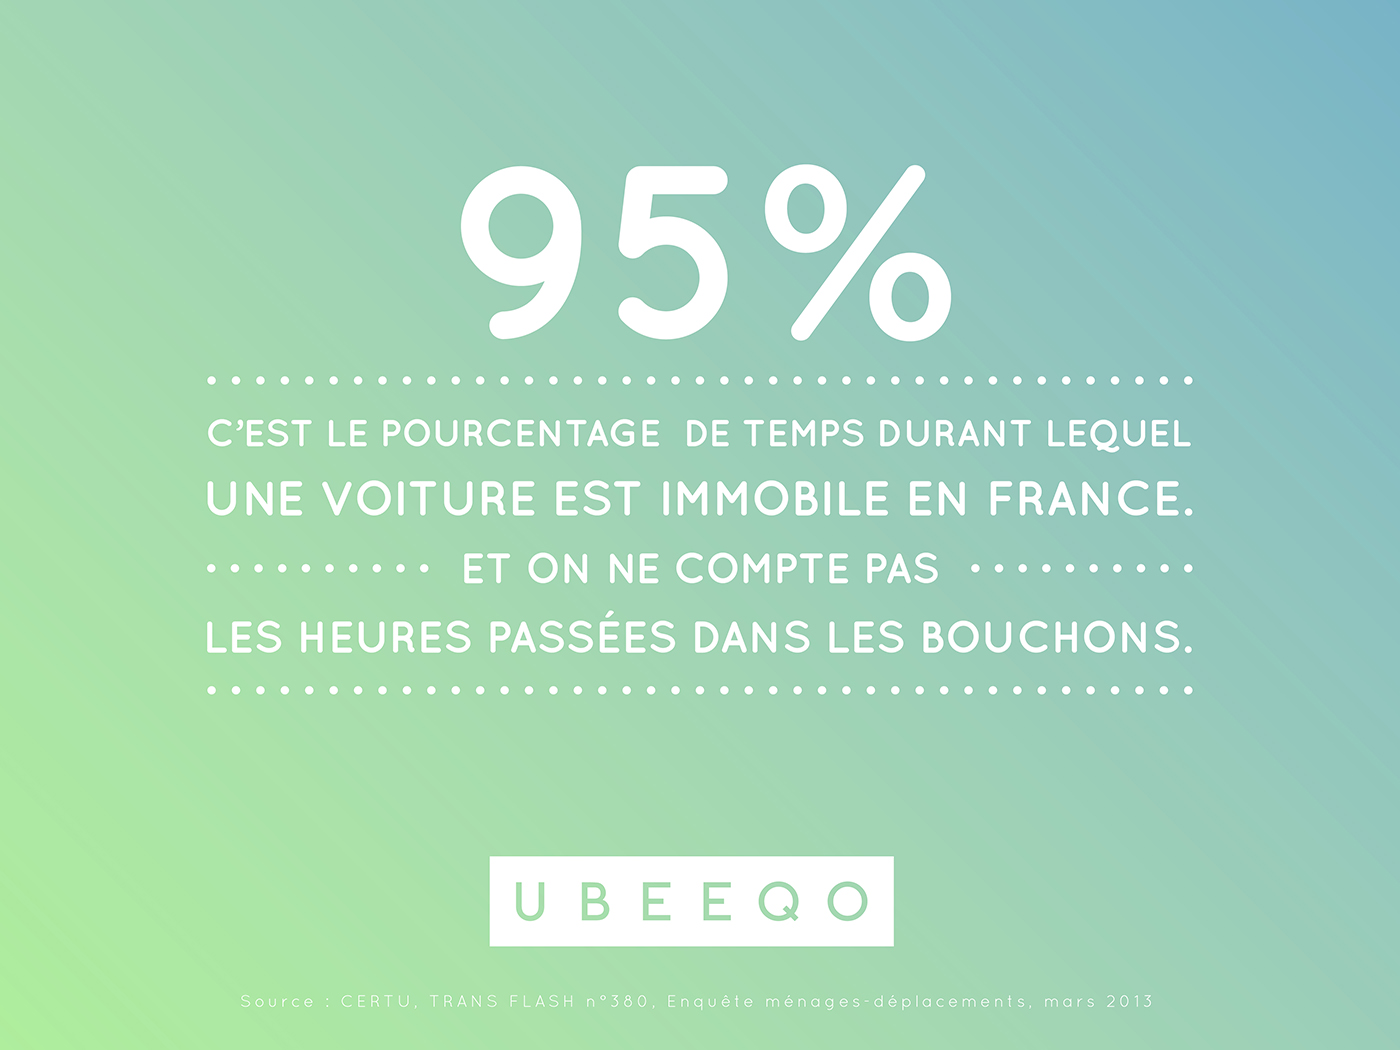 ubeeqo-application-automobile-partage-paris-chiffres-absurdes-publicite-marketing-stunt-2016-agence-clm-bbdo-1